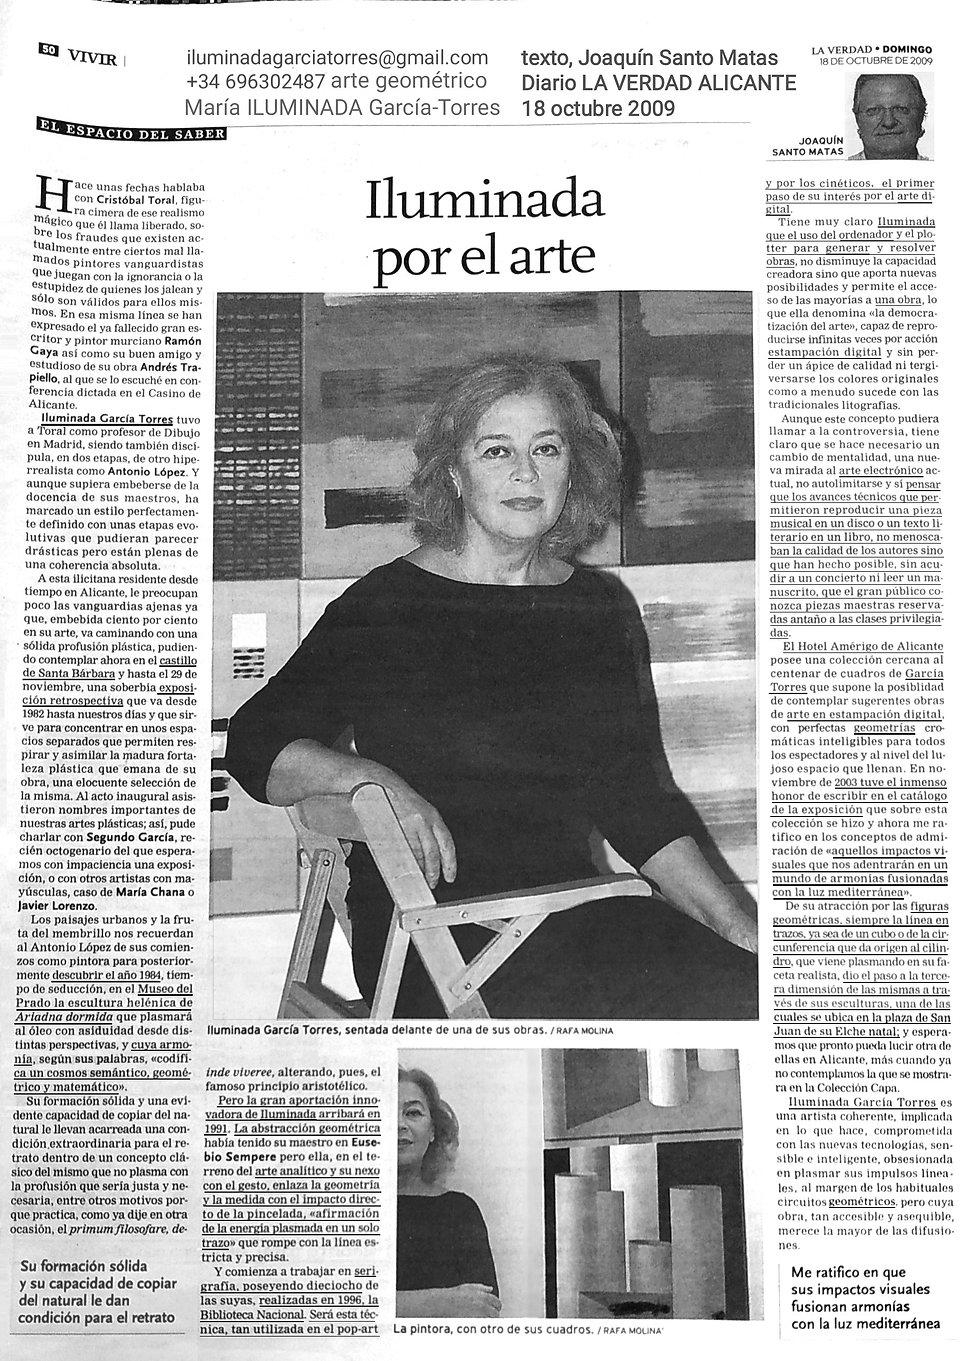 2009 texto Joaquín Santo Matas Diario LA VERDAD Alicante exposición Retrospectiva de ILUMI